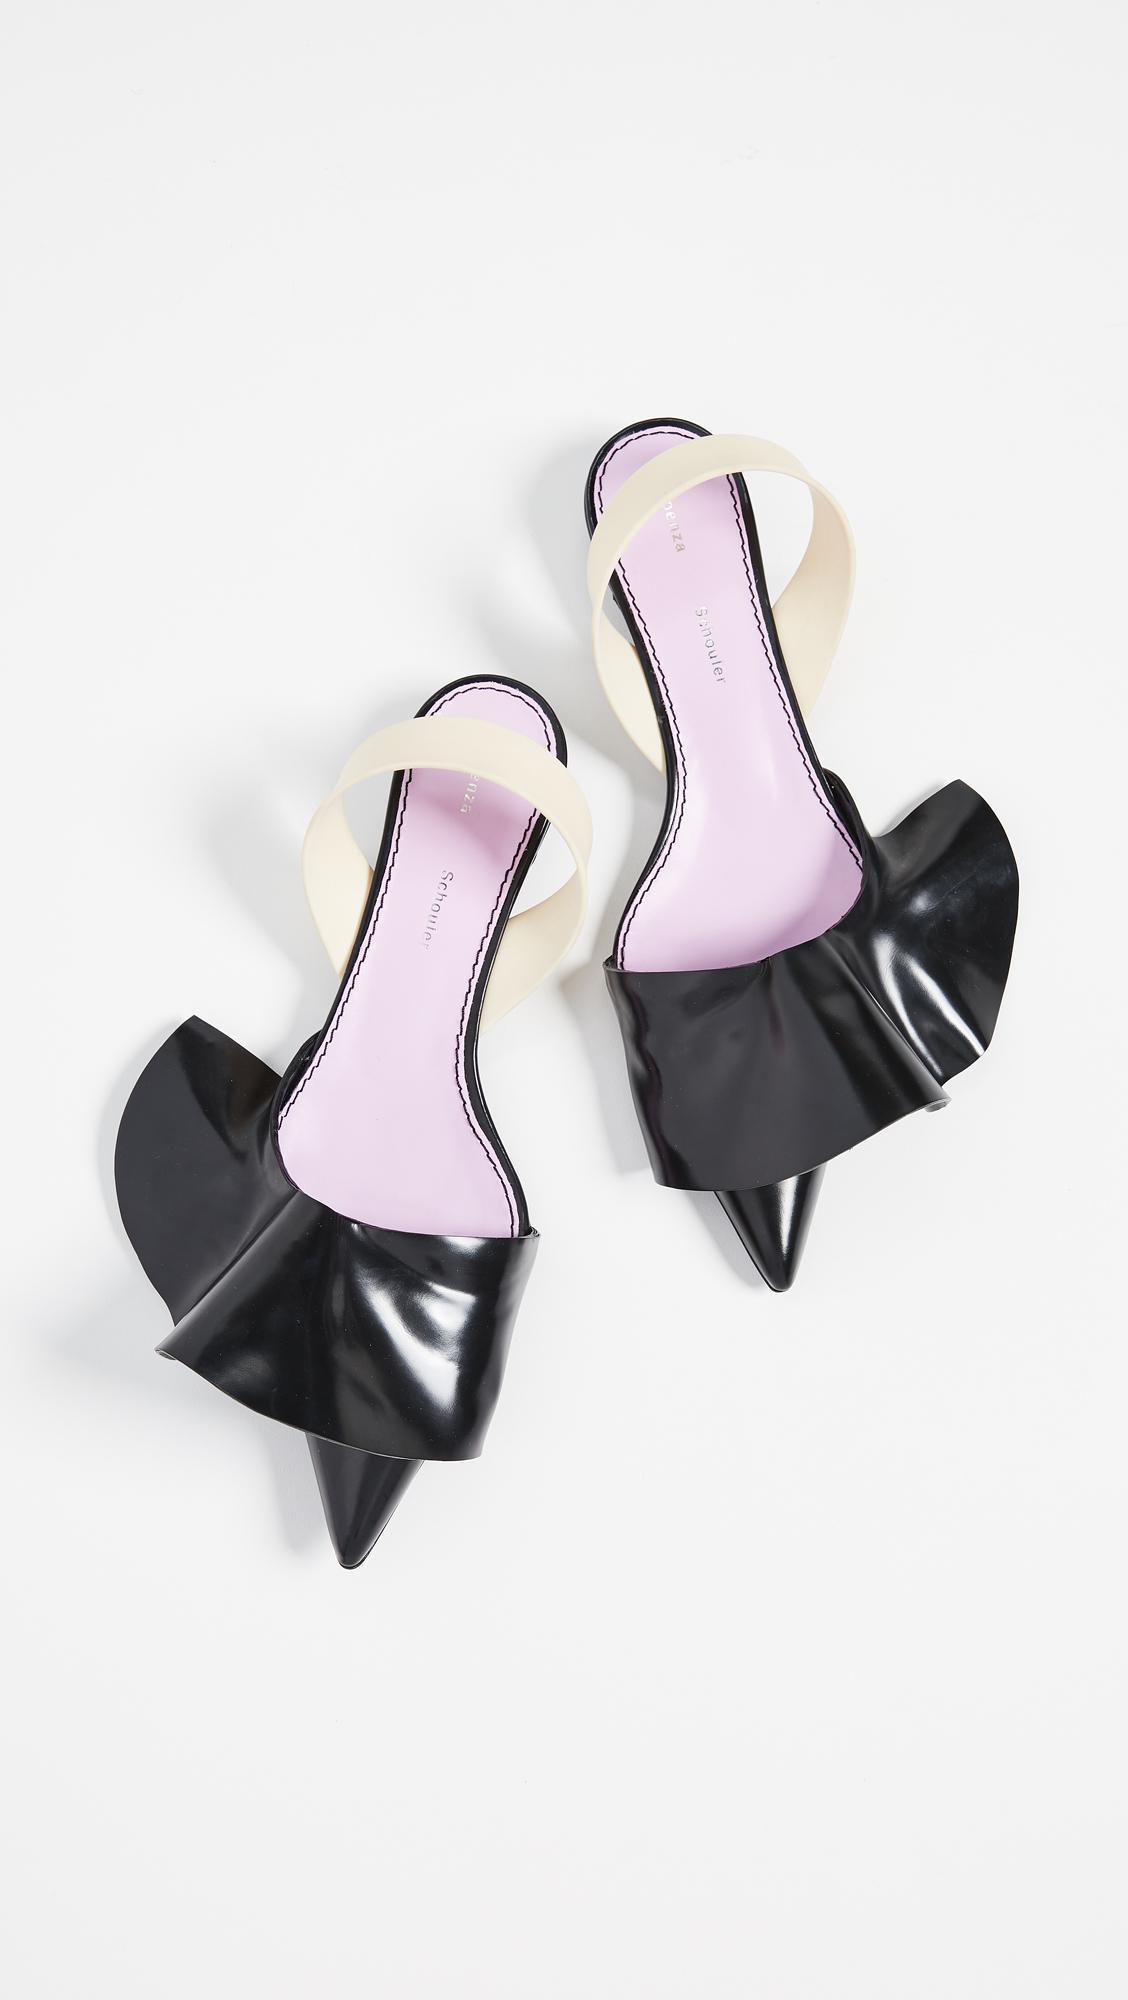 a120d7154ba Lyst - Proenza Schouler Ruffle Kitten Heel Flats in Black